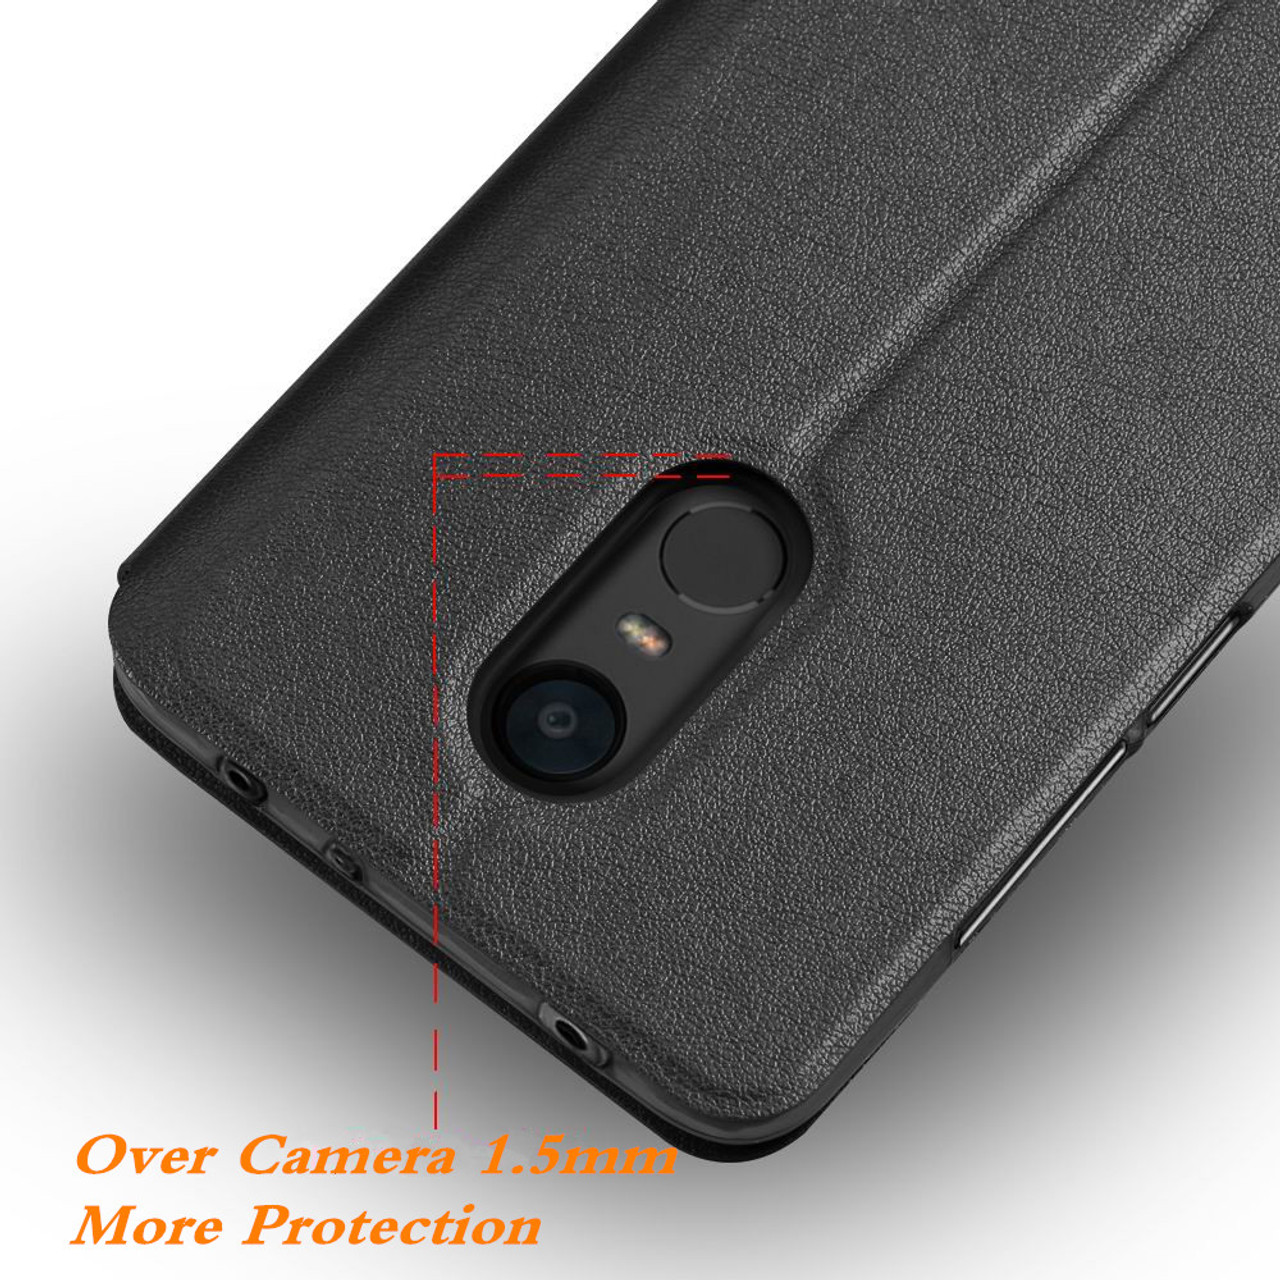 wholesale dealer 60b43 845d6 MOFi for Xiaomi Redmi 5 Plus Case for redmi 5 plus flip case cover Leather  Capas coque for xiomi redmi 5 plus housing original